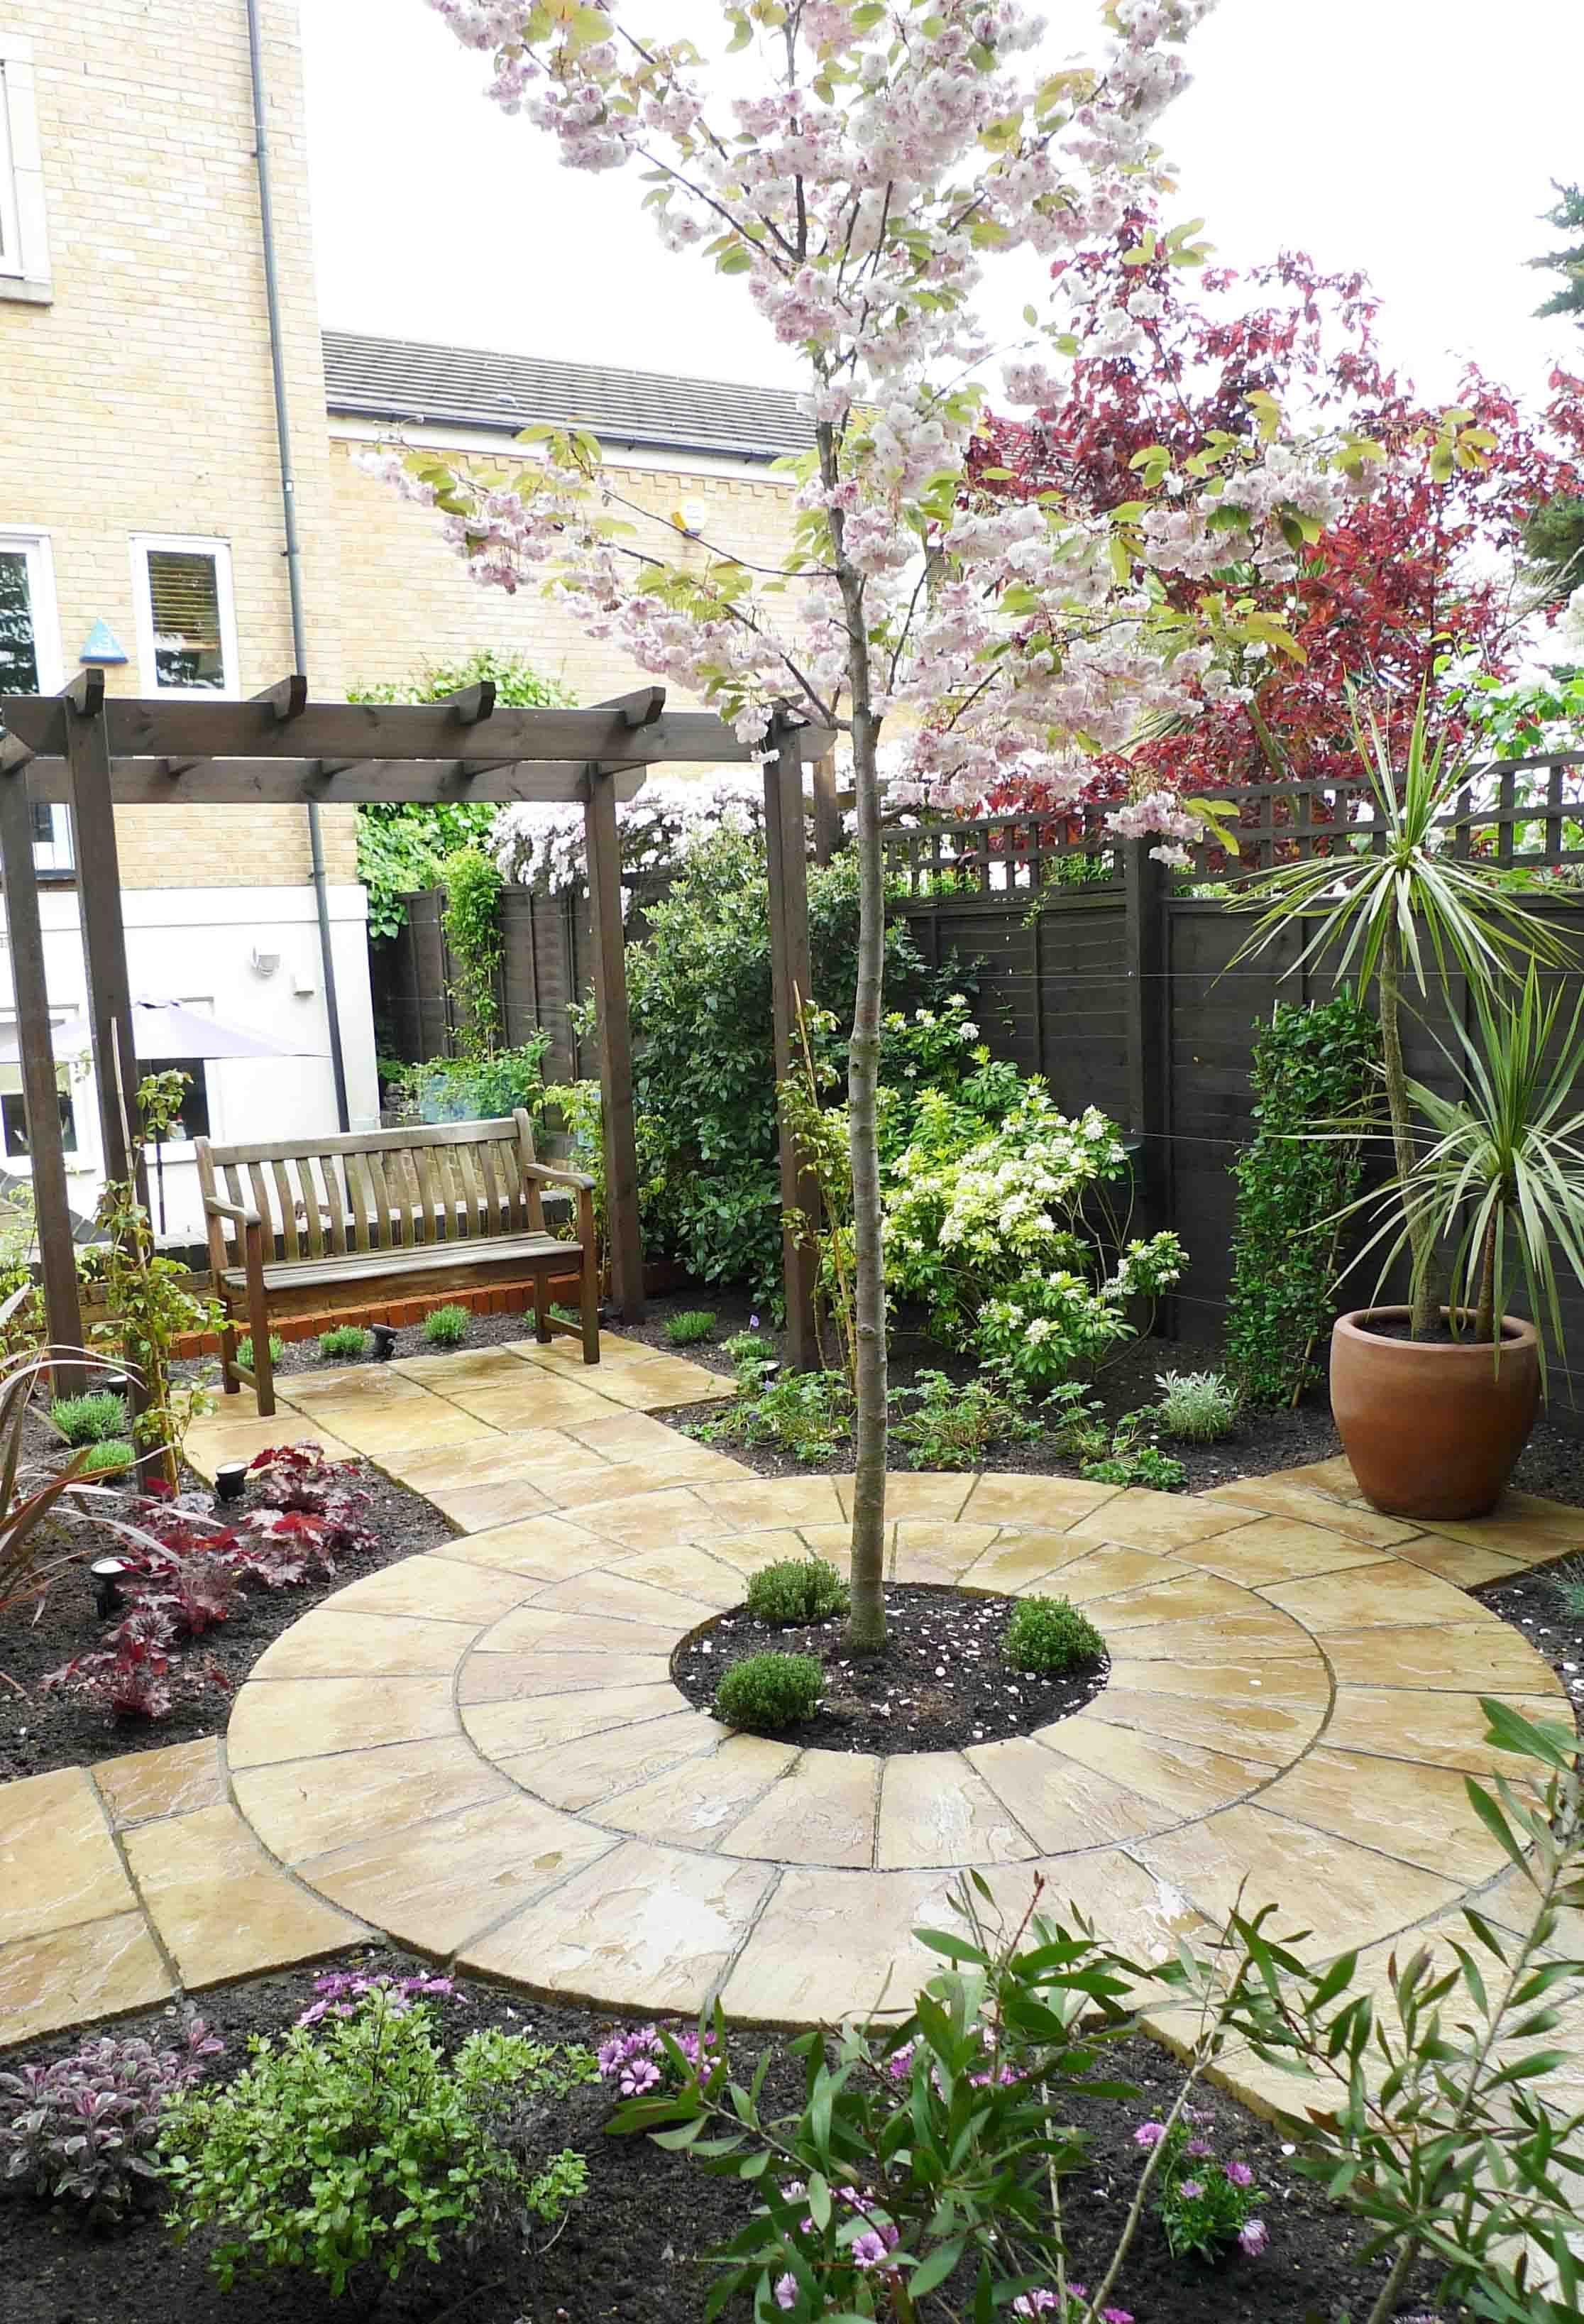 Beautiful courtyard garden with swing love the circular stone